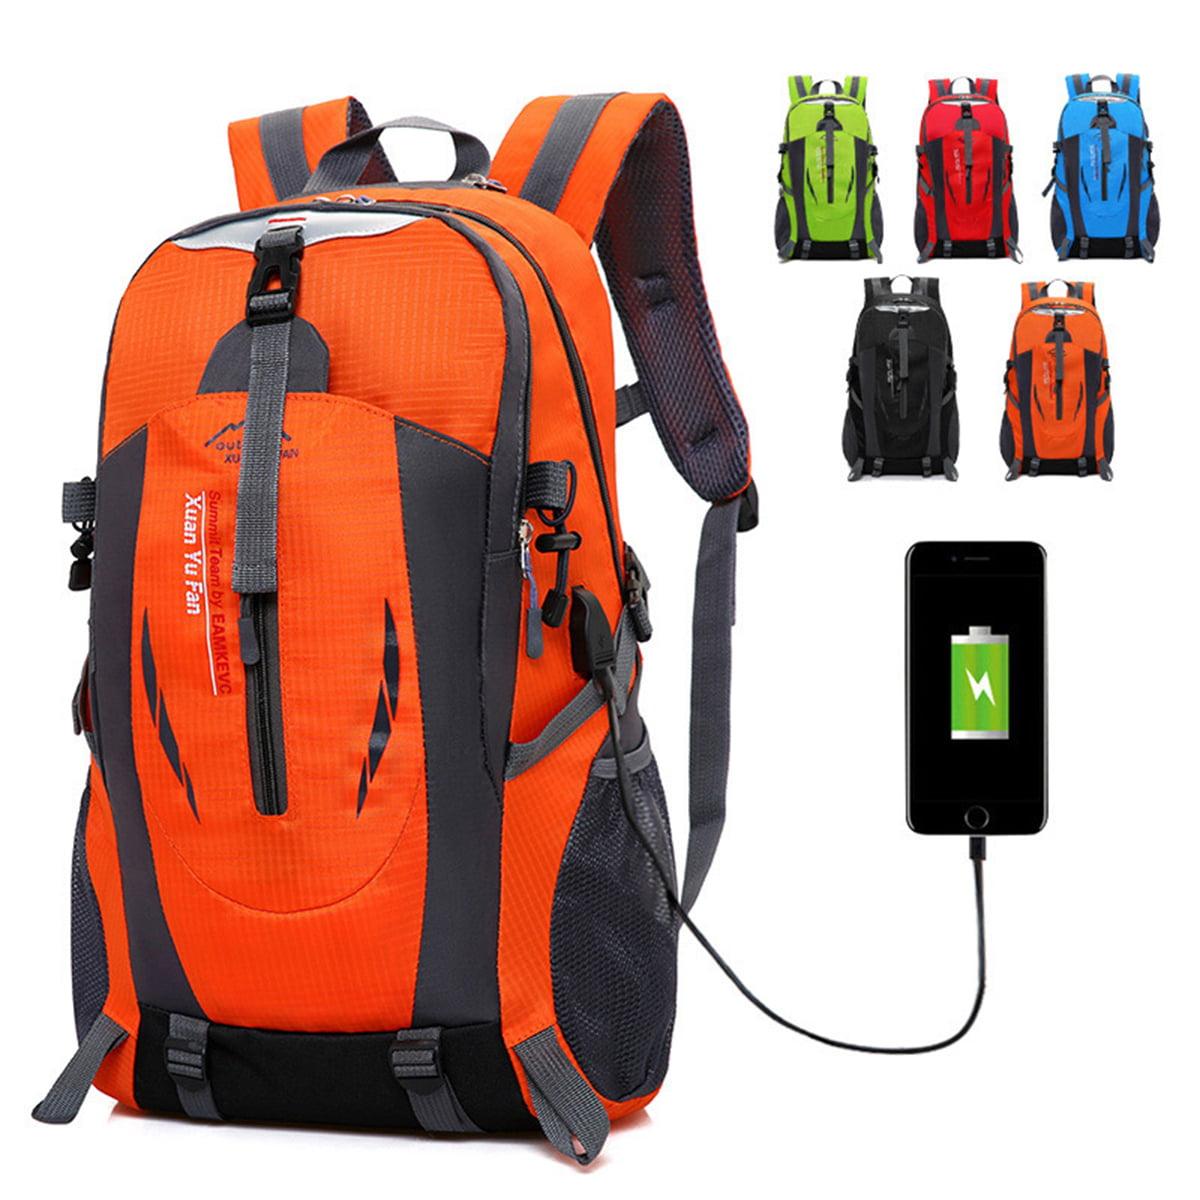 50L Tactical Military Backpack Hiking Trekking Bag USB Port Waterproof Outdoor